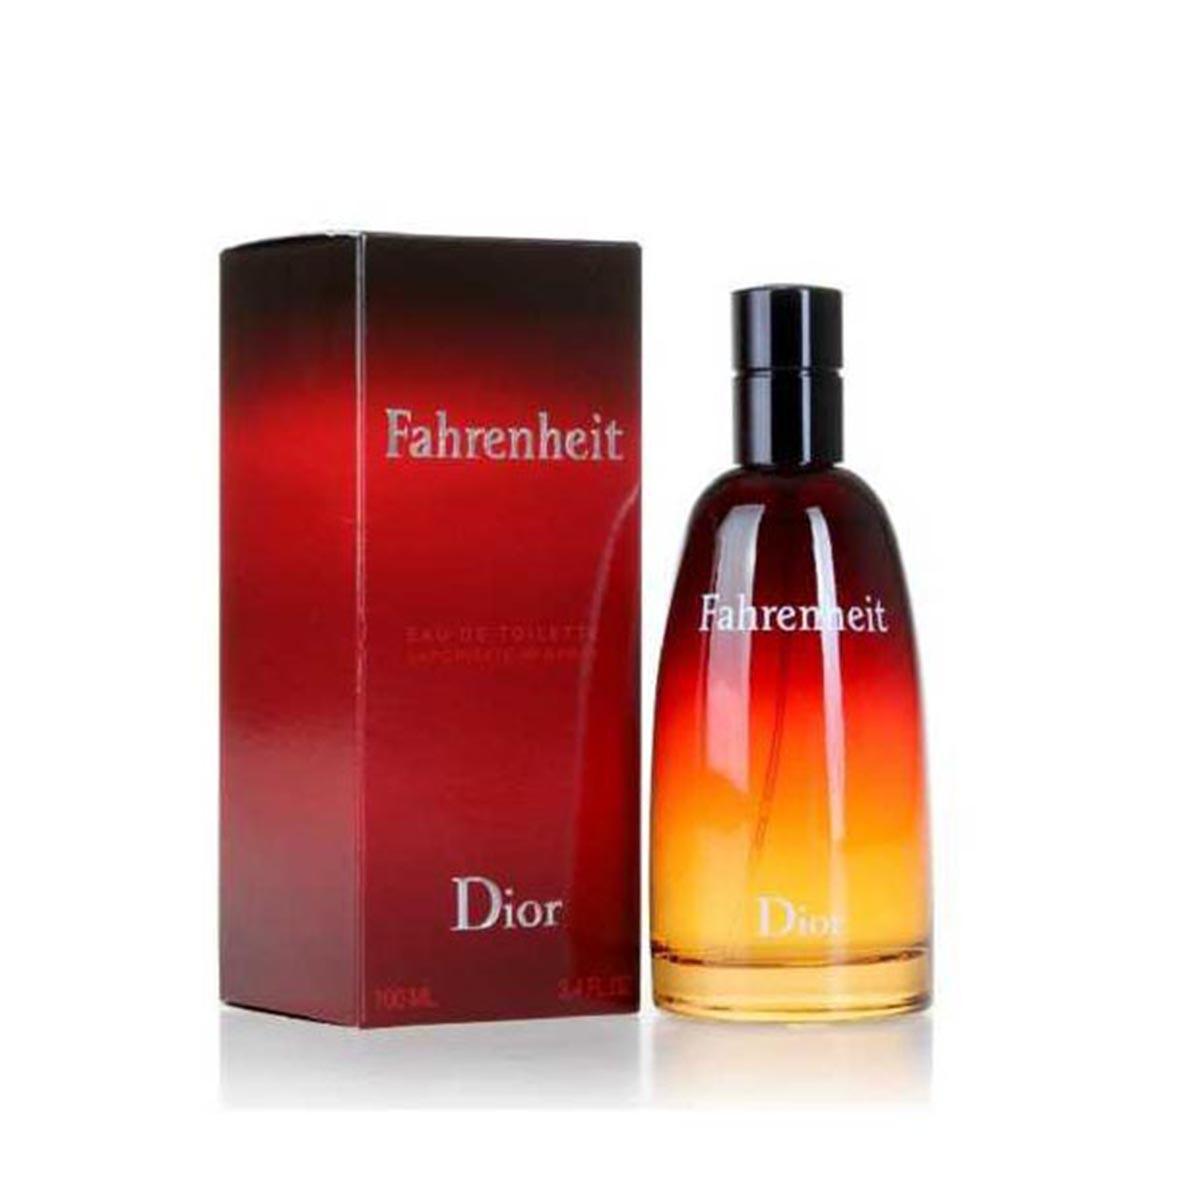 e036060d59 Dior fragrances Fahrenheit After Shave Lotion 100ml